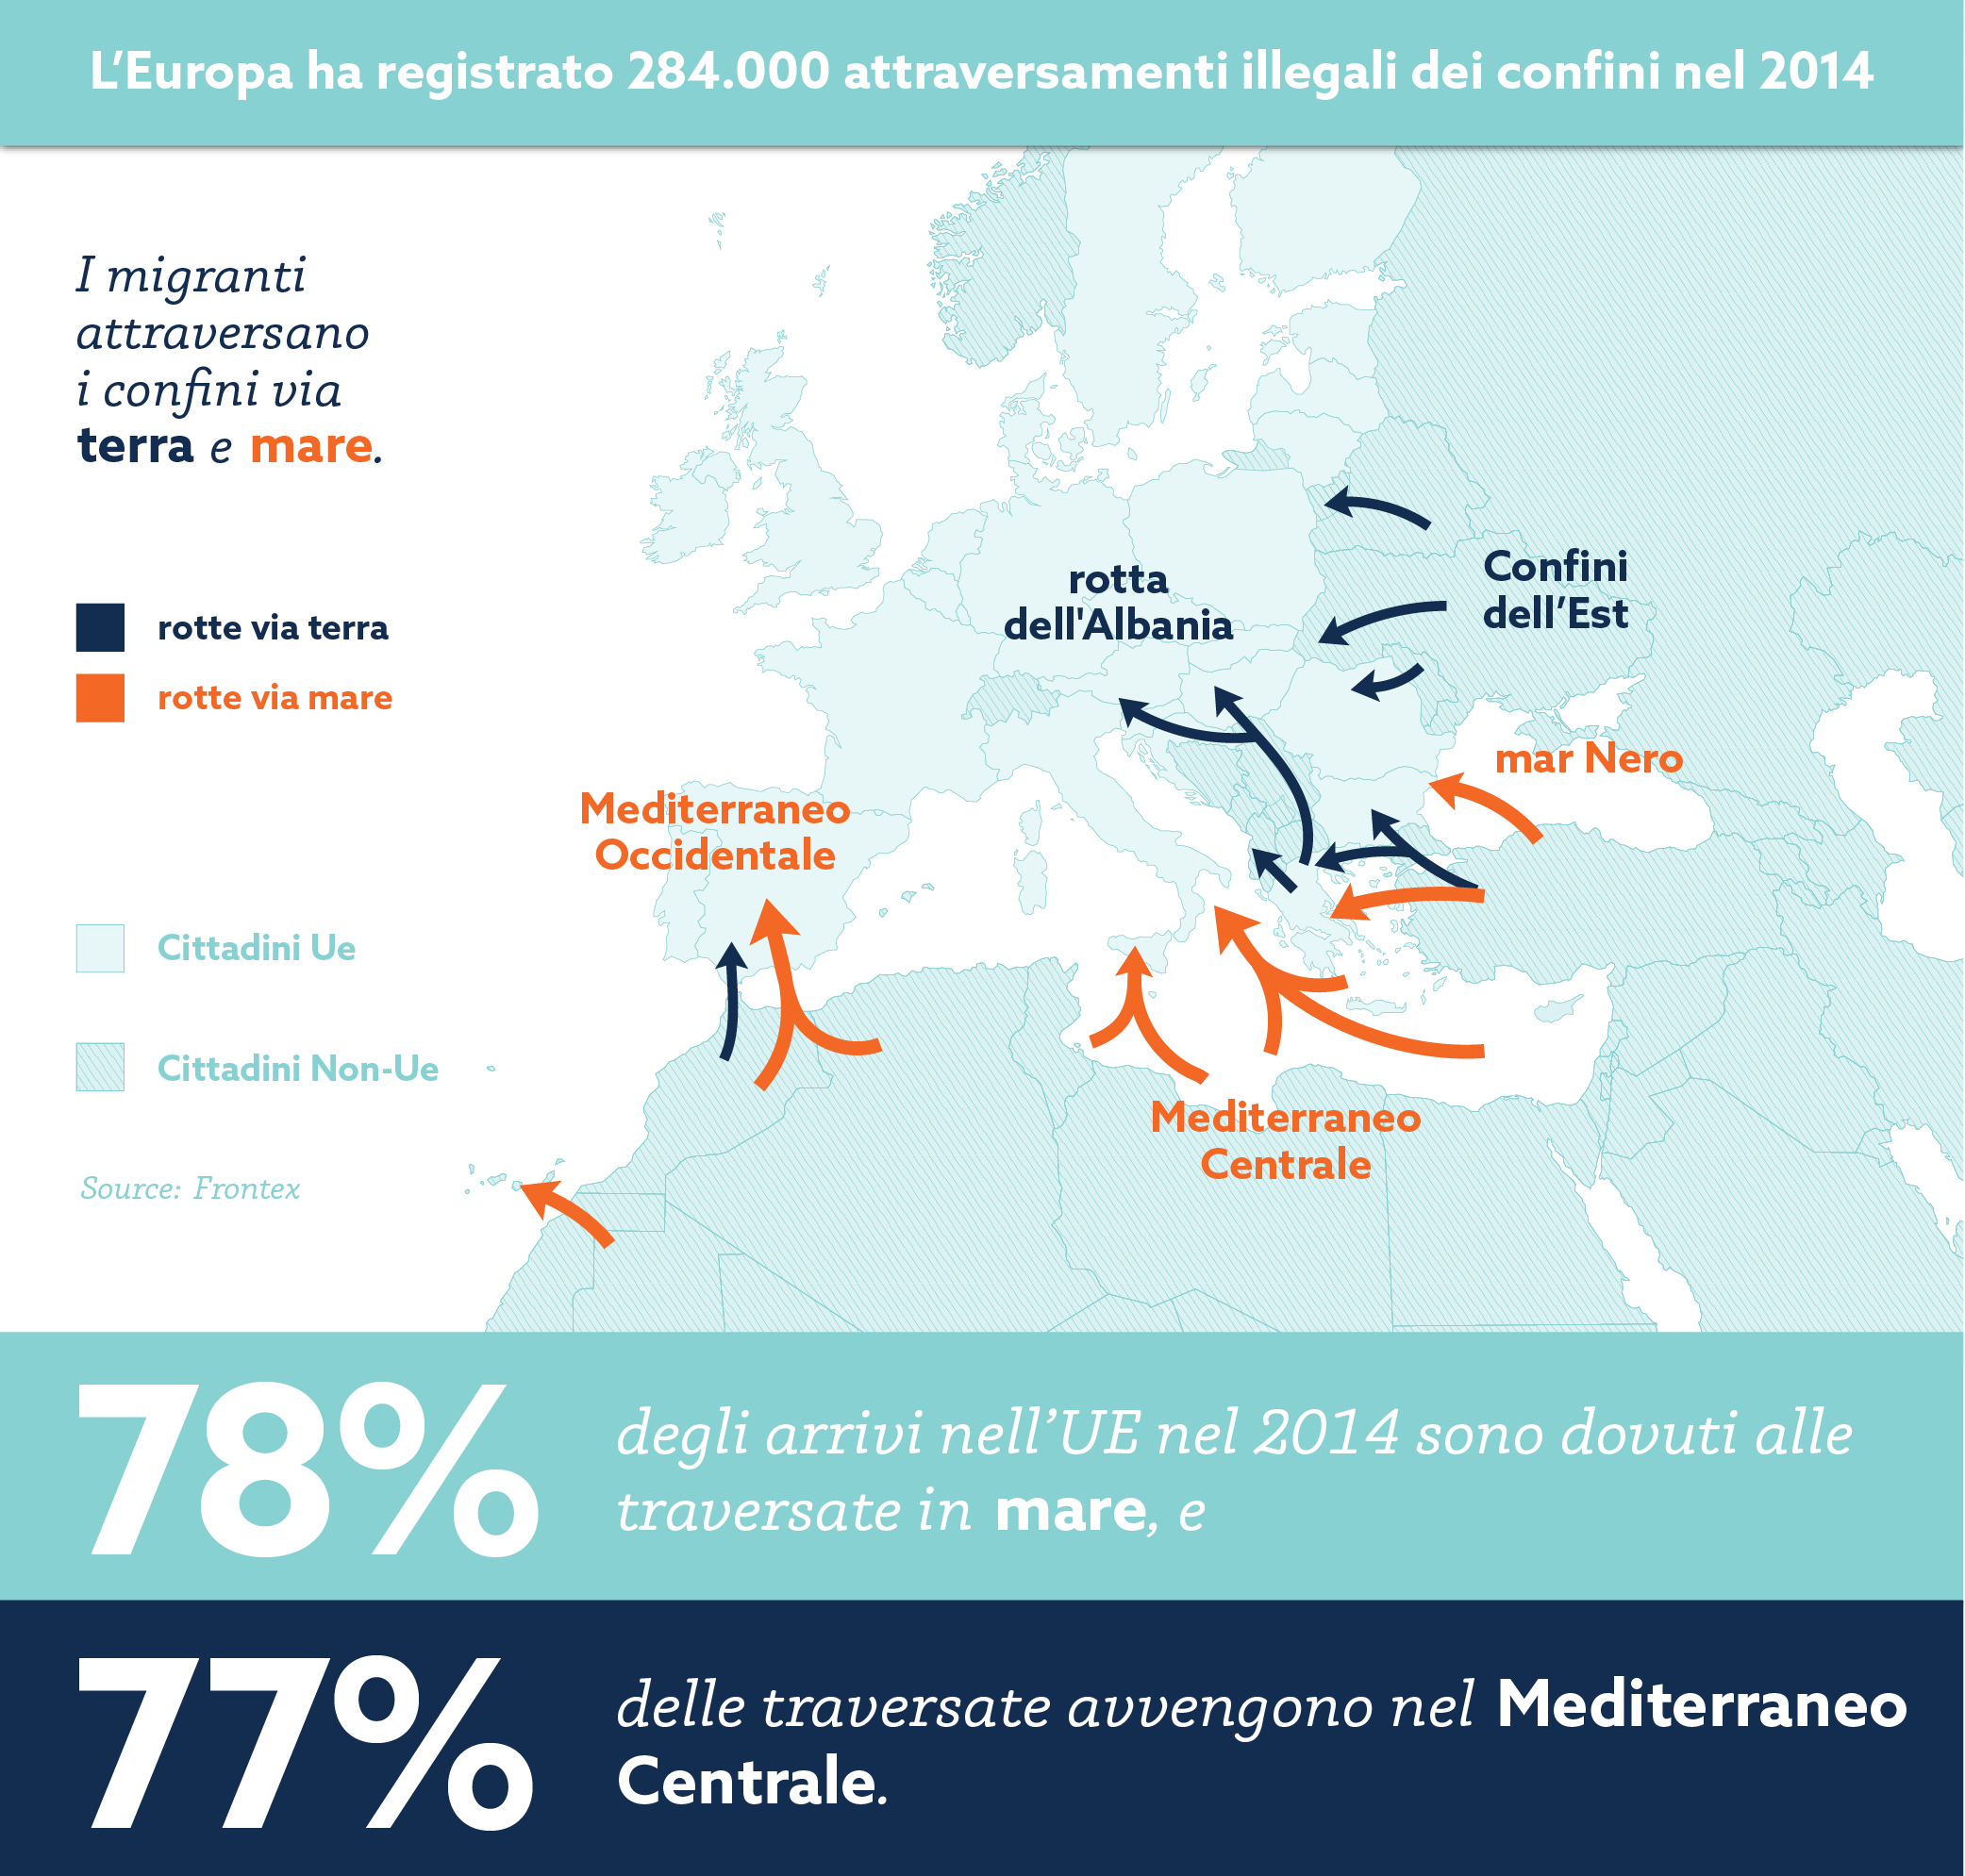 ITALIAN_Migrants_Organized_Part1-02.png